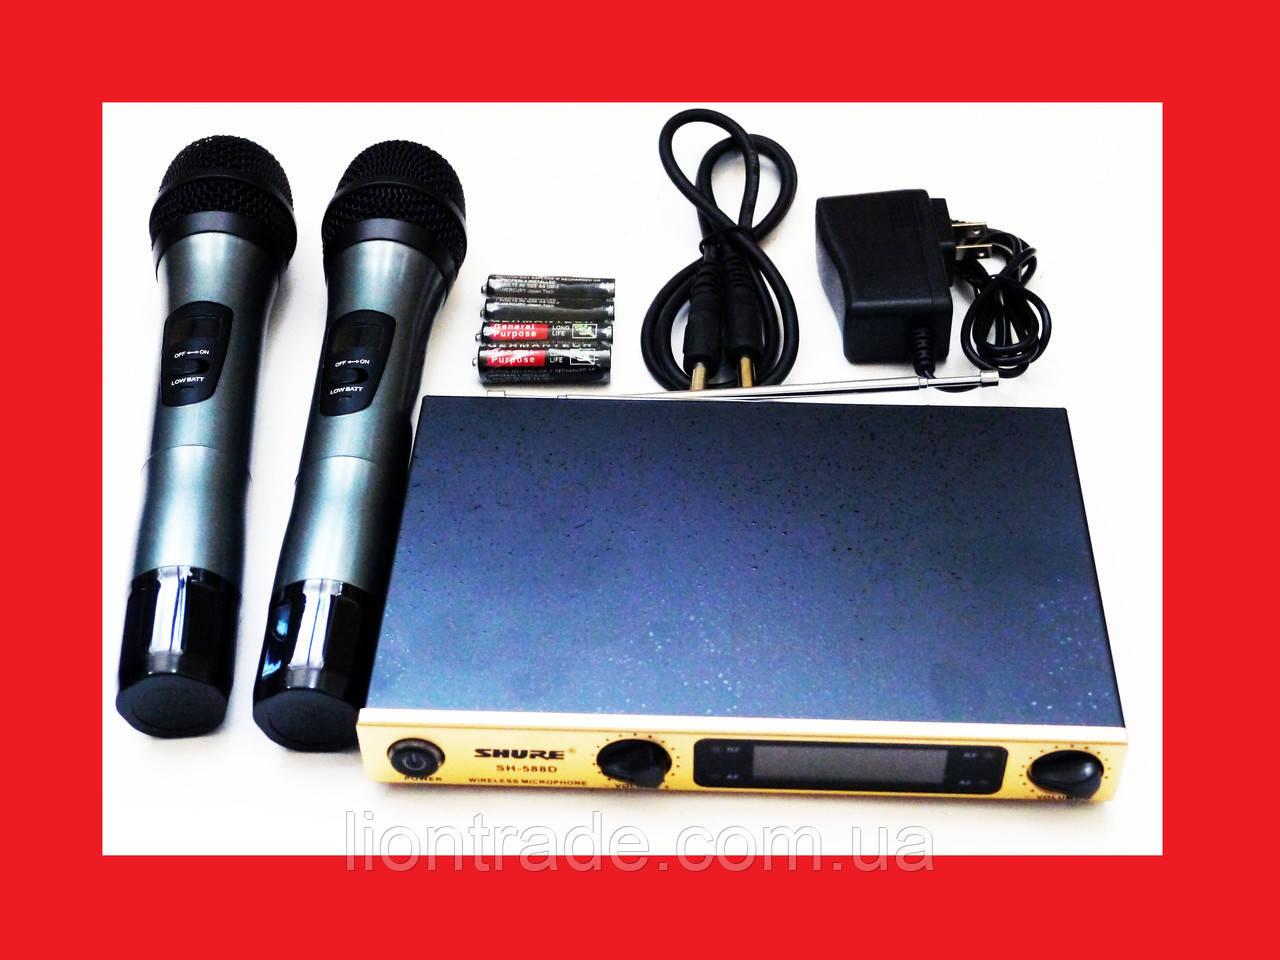 Радіосистема SHURE SH-588D база 2 радіомікрофона